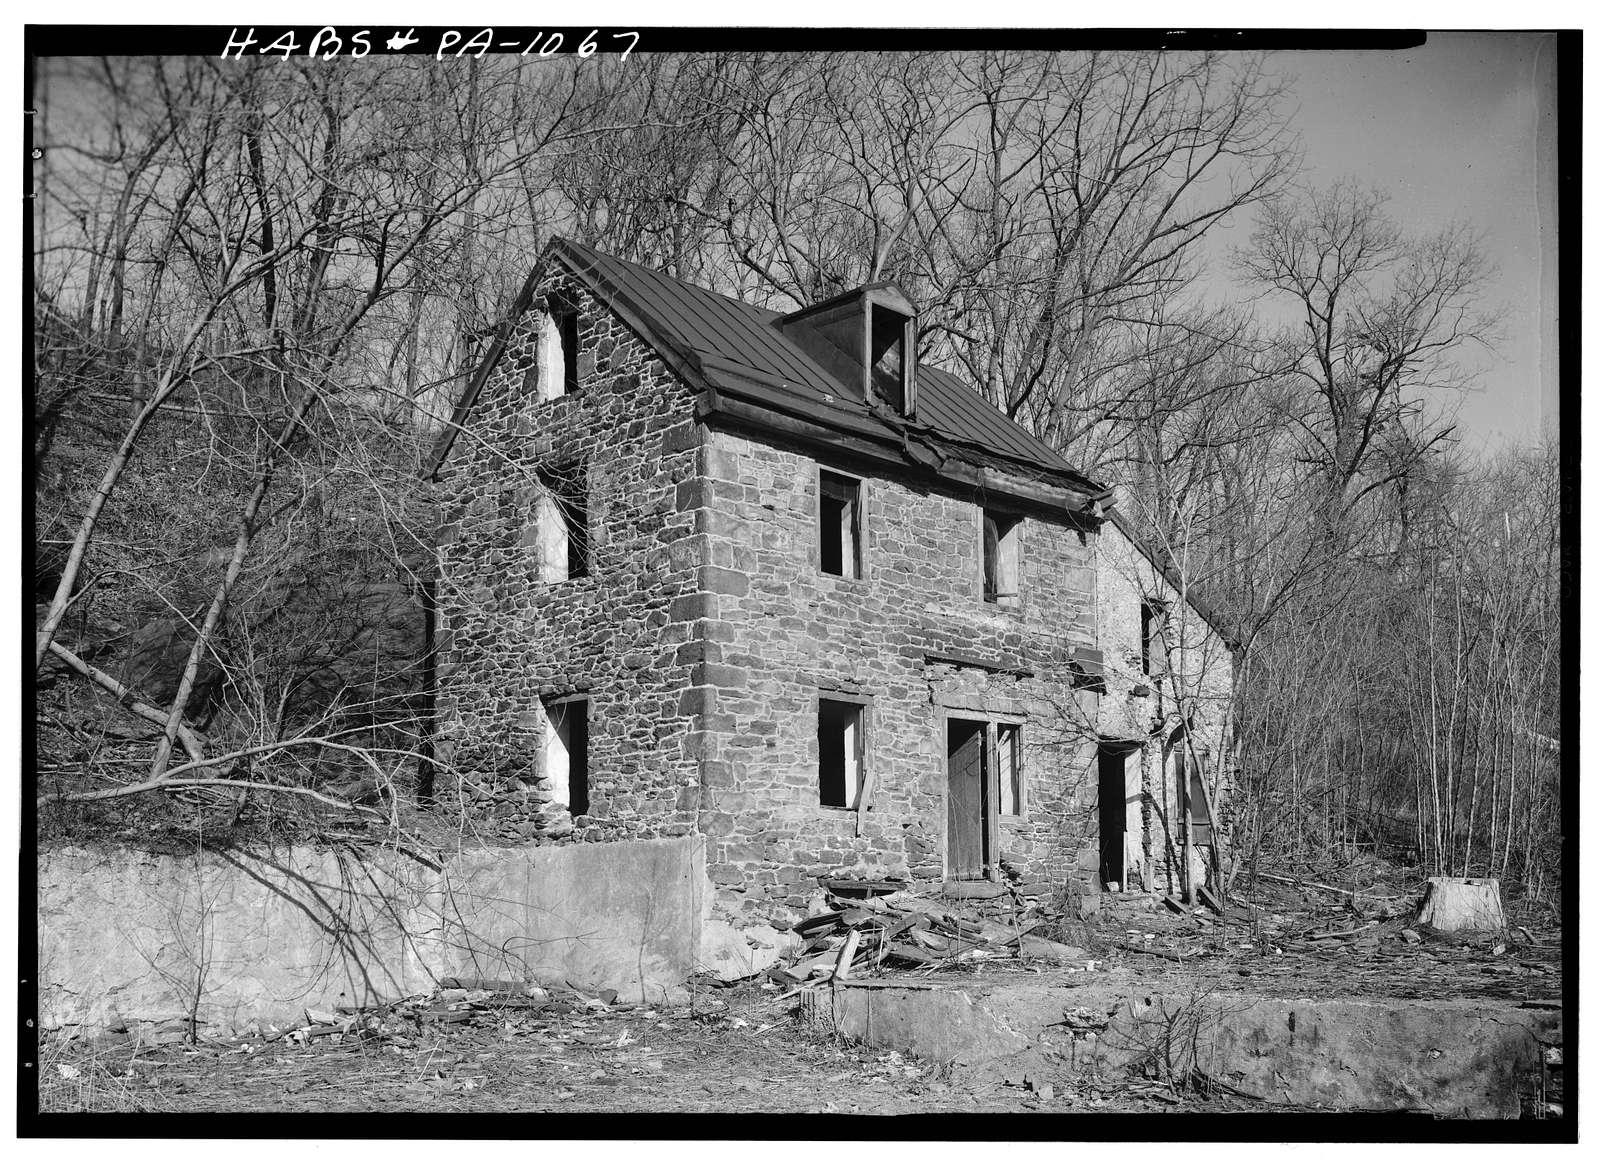 Shoomac Park, Ridge Avenue & Wissahickon Drive, Philadelphia, Philadelphia County, PA